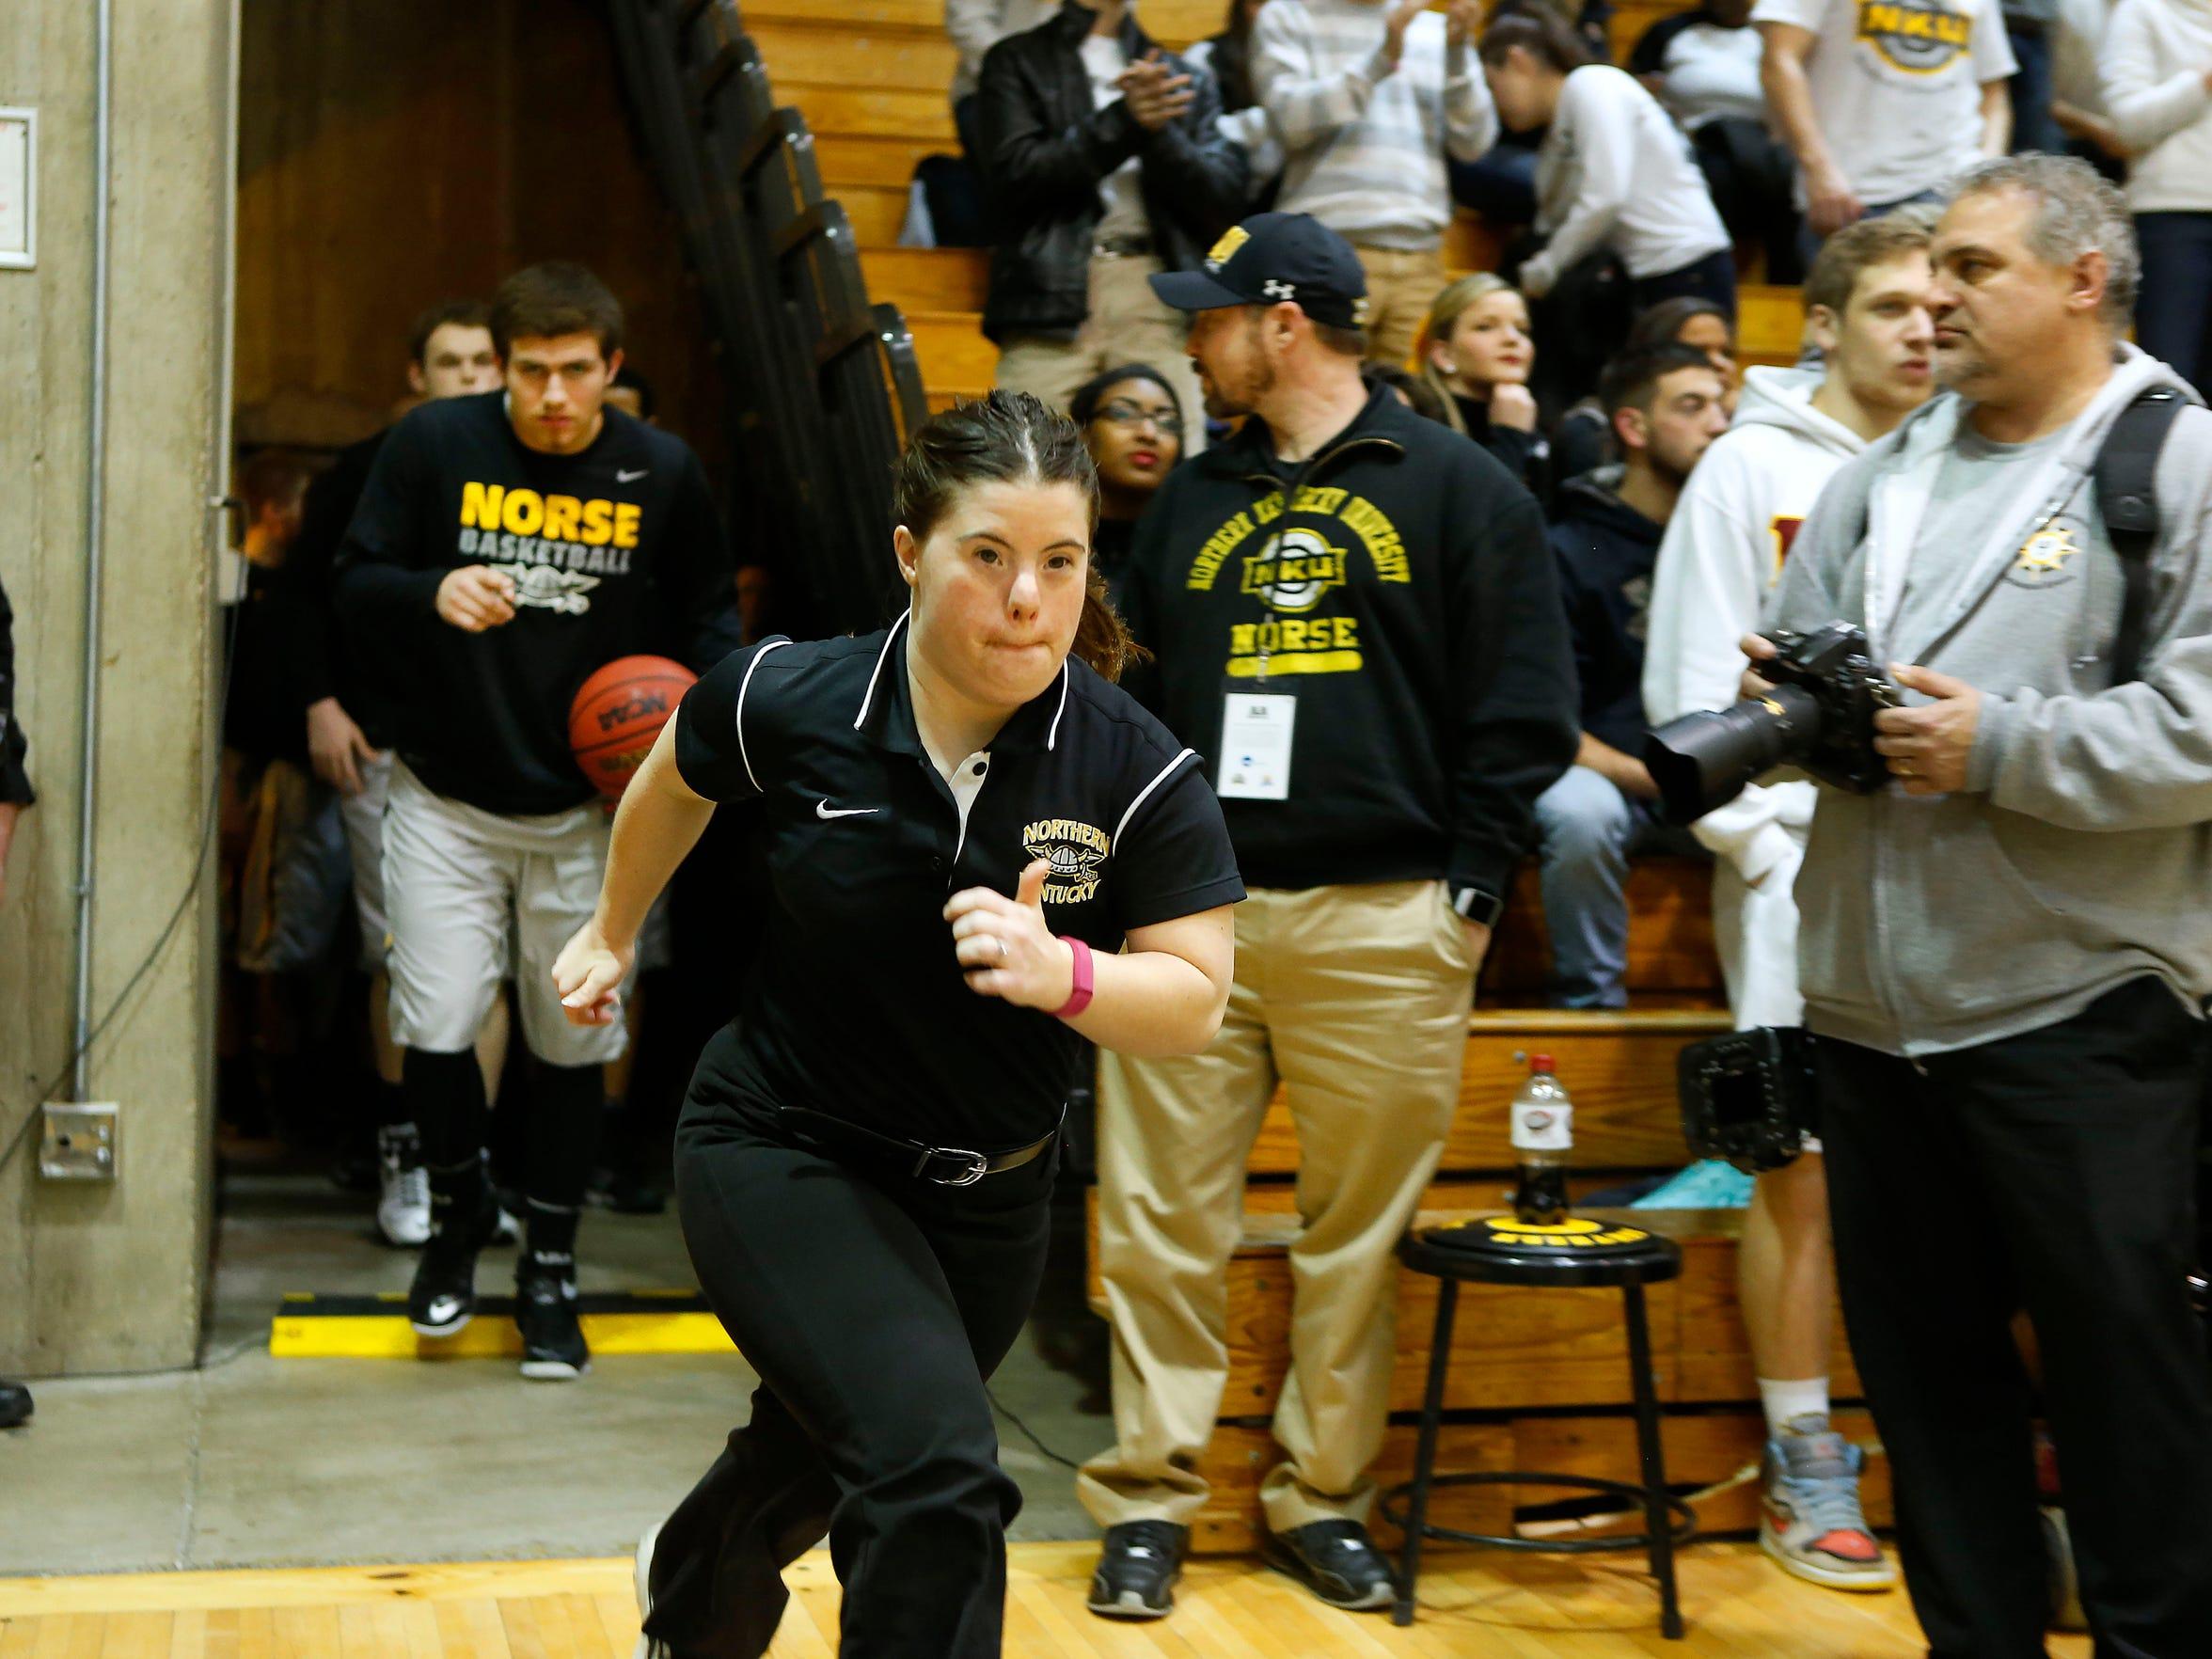 Jillian Daugherty, 25, men's basketball manager for